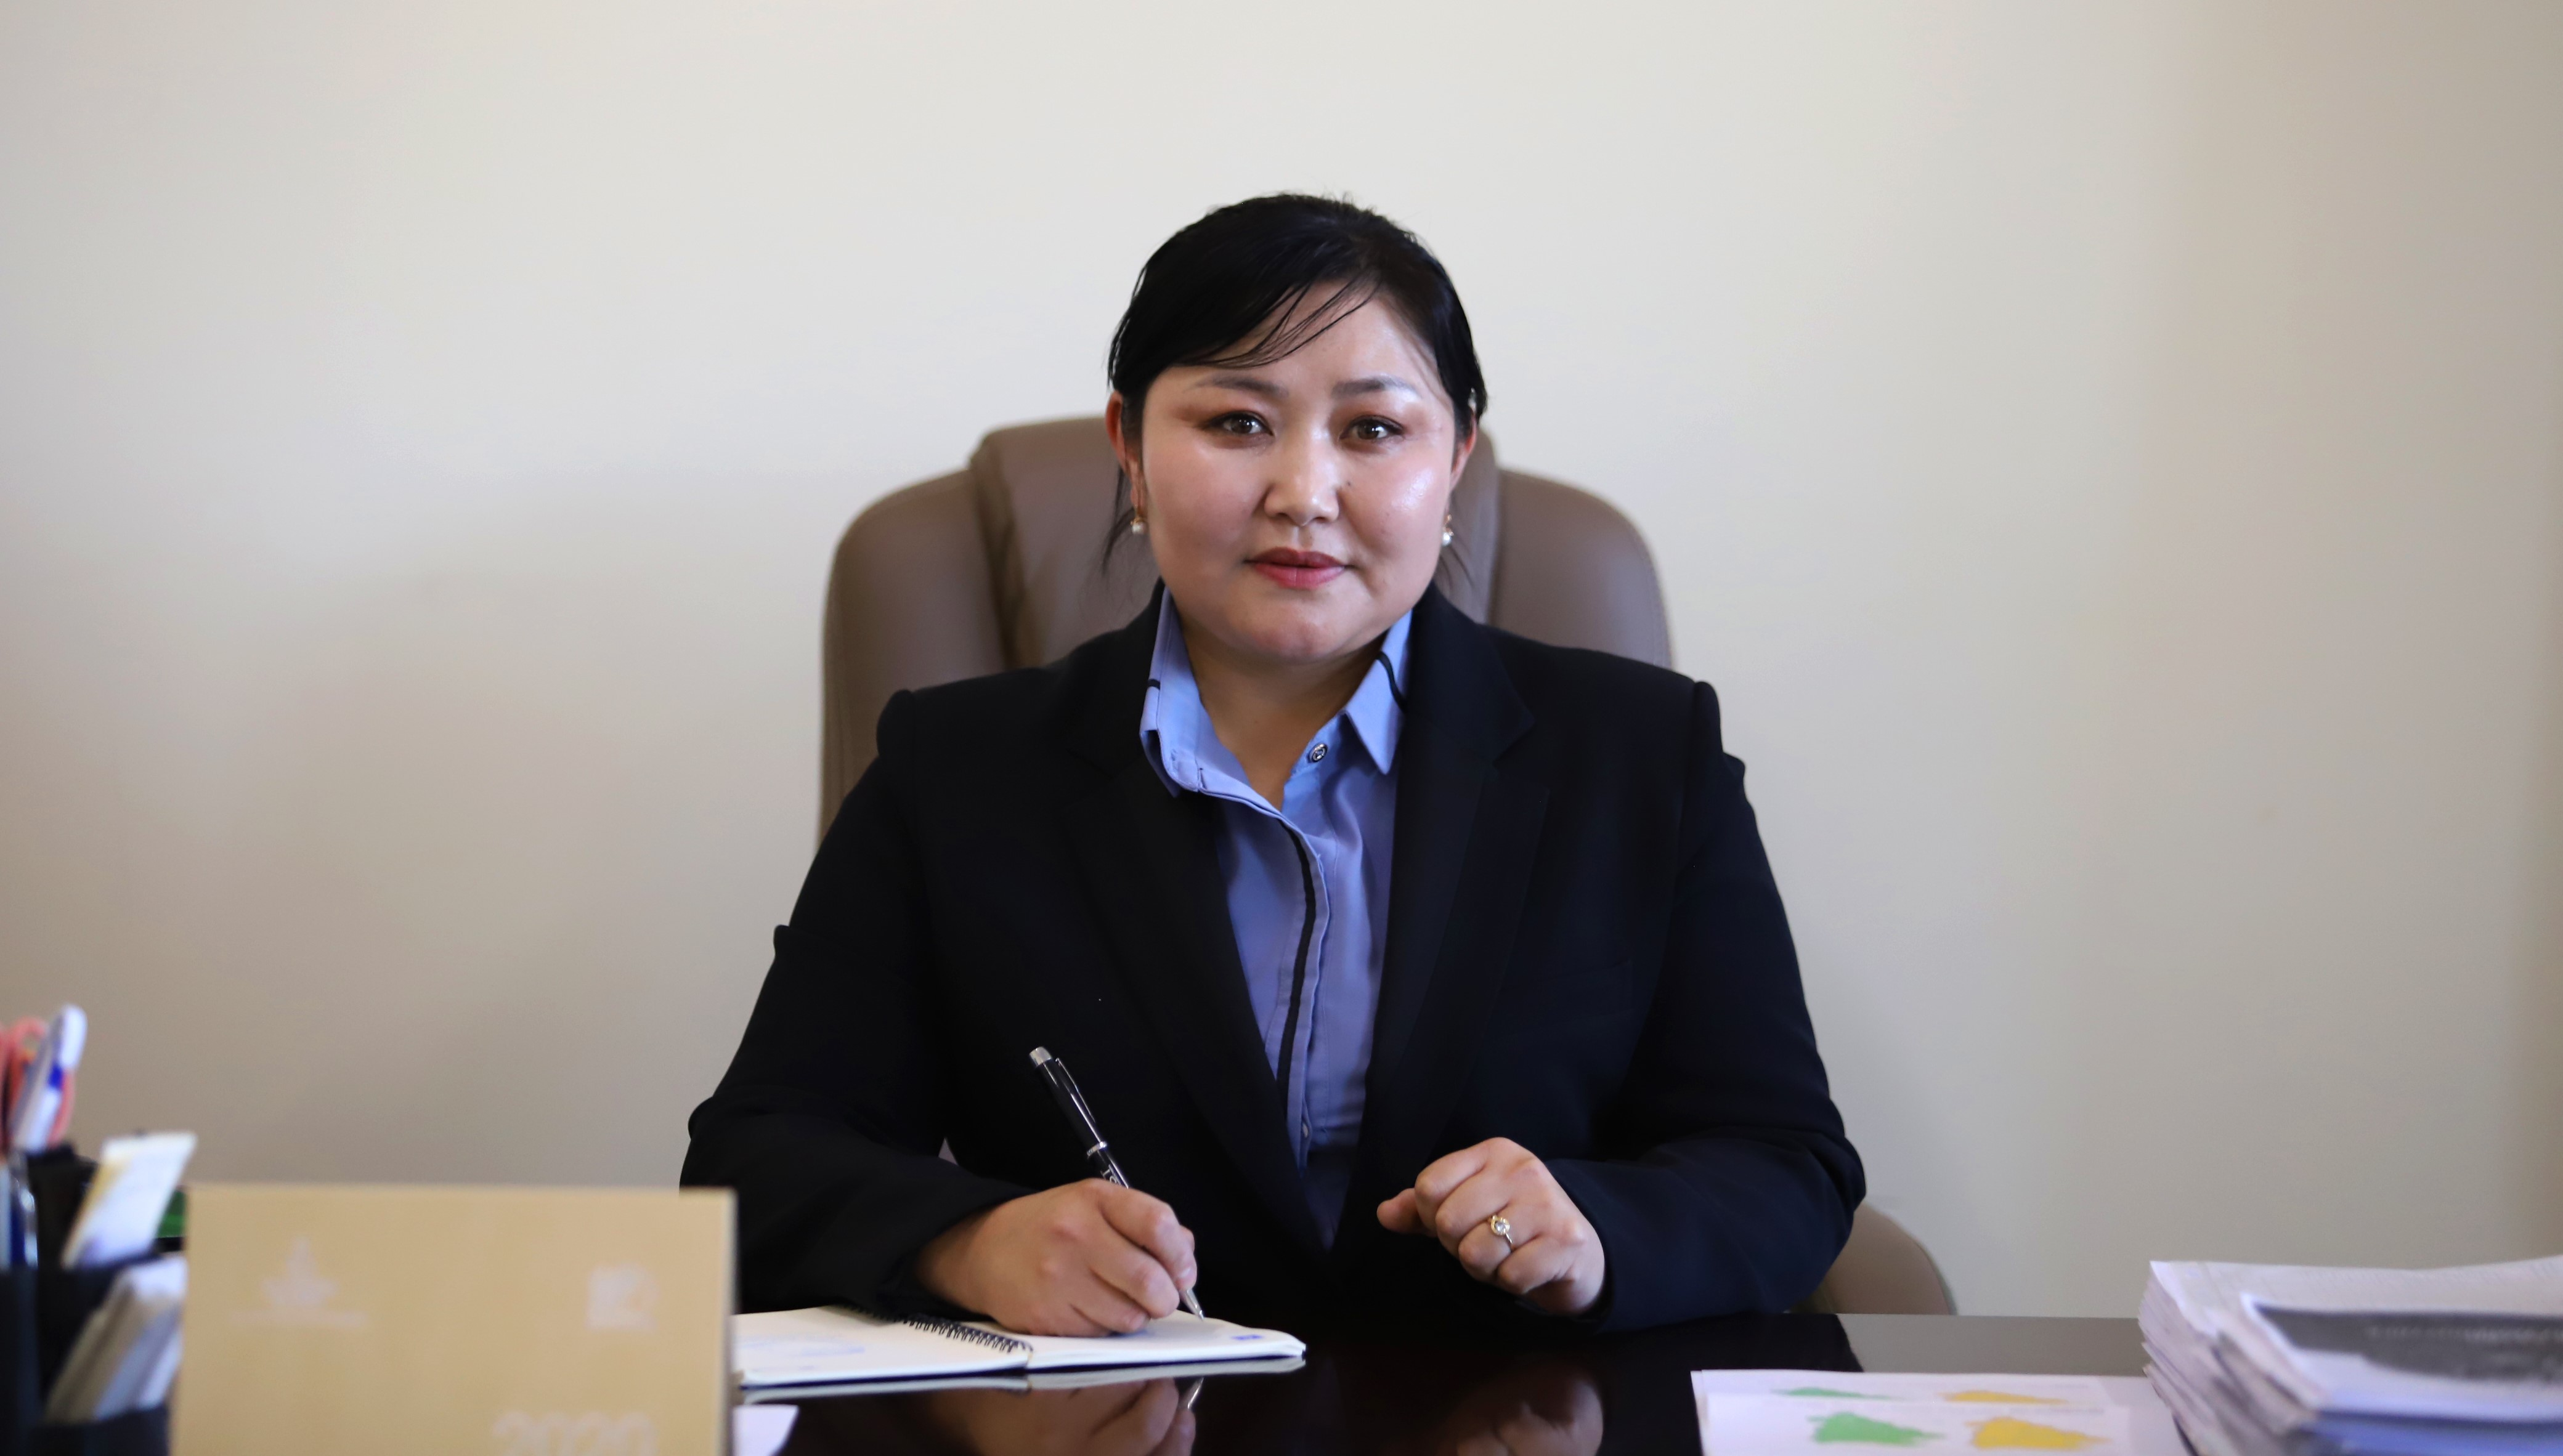 Delger, Governor of Gurvanbulag soum, Bulgan province